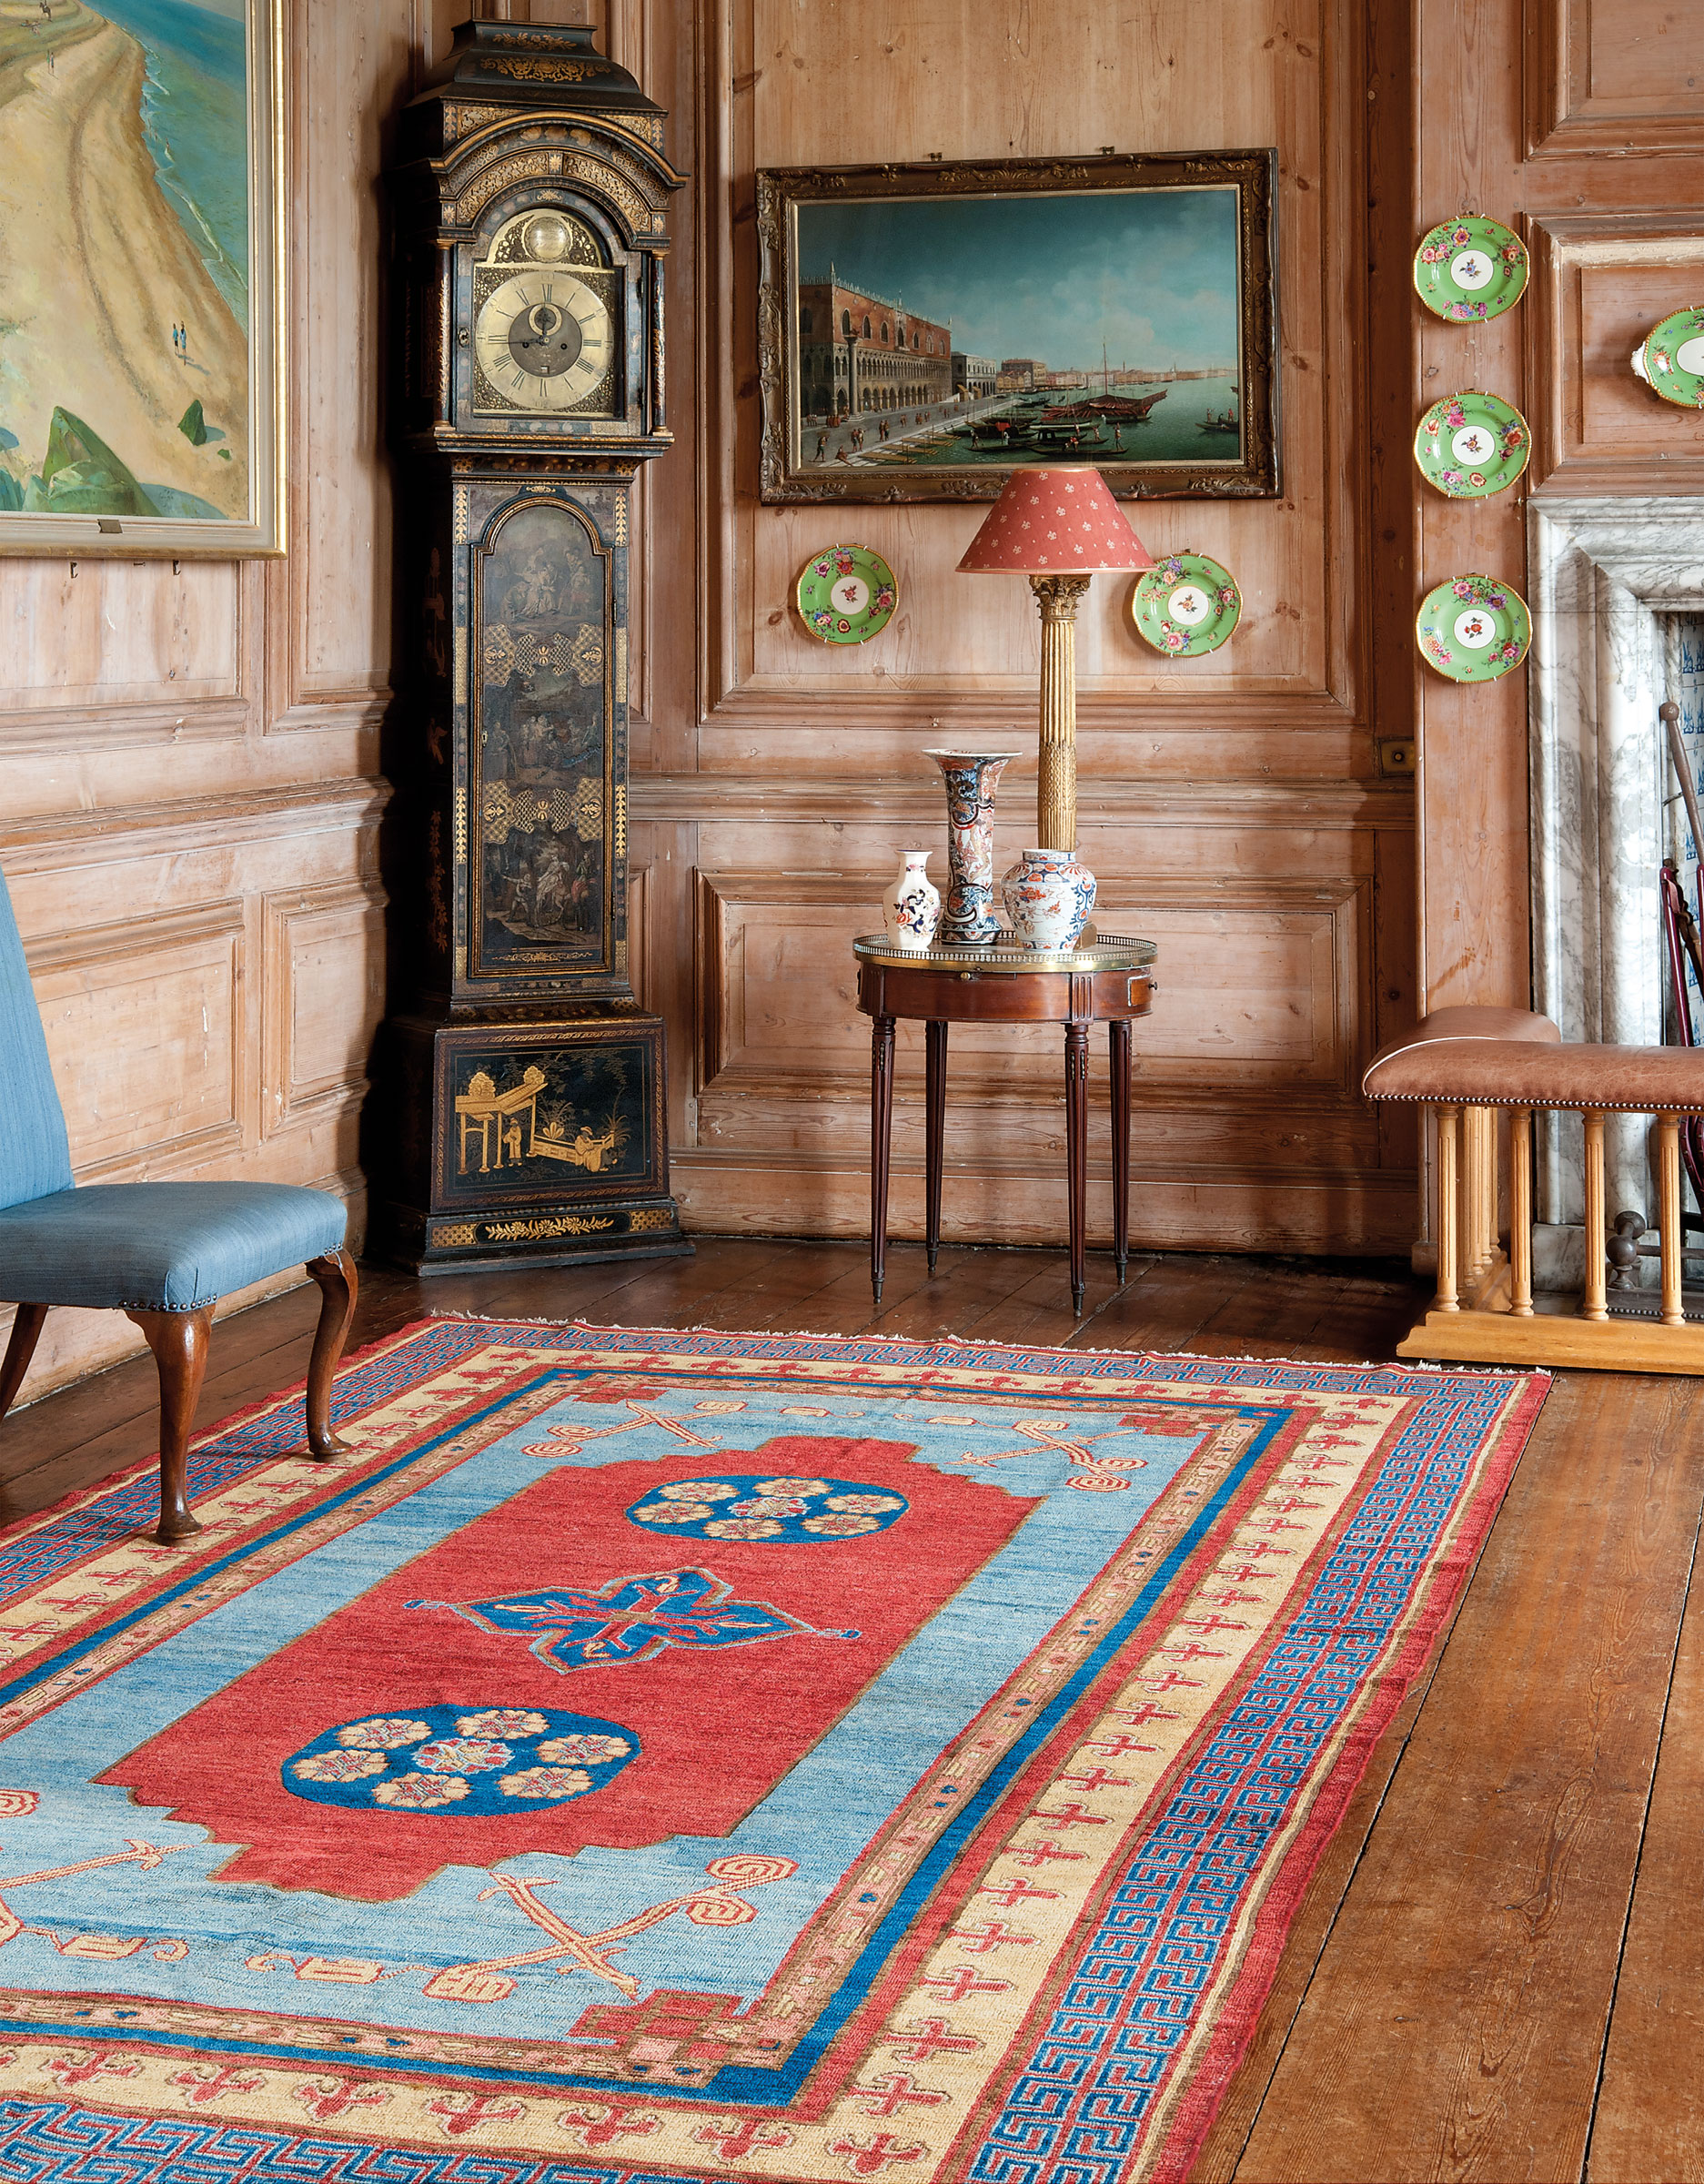 A Khotan carpet. East Turkestan, second half 18th century. 12 ft 11 in